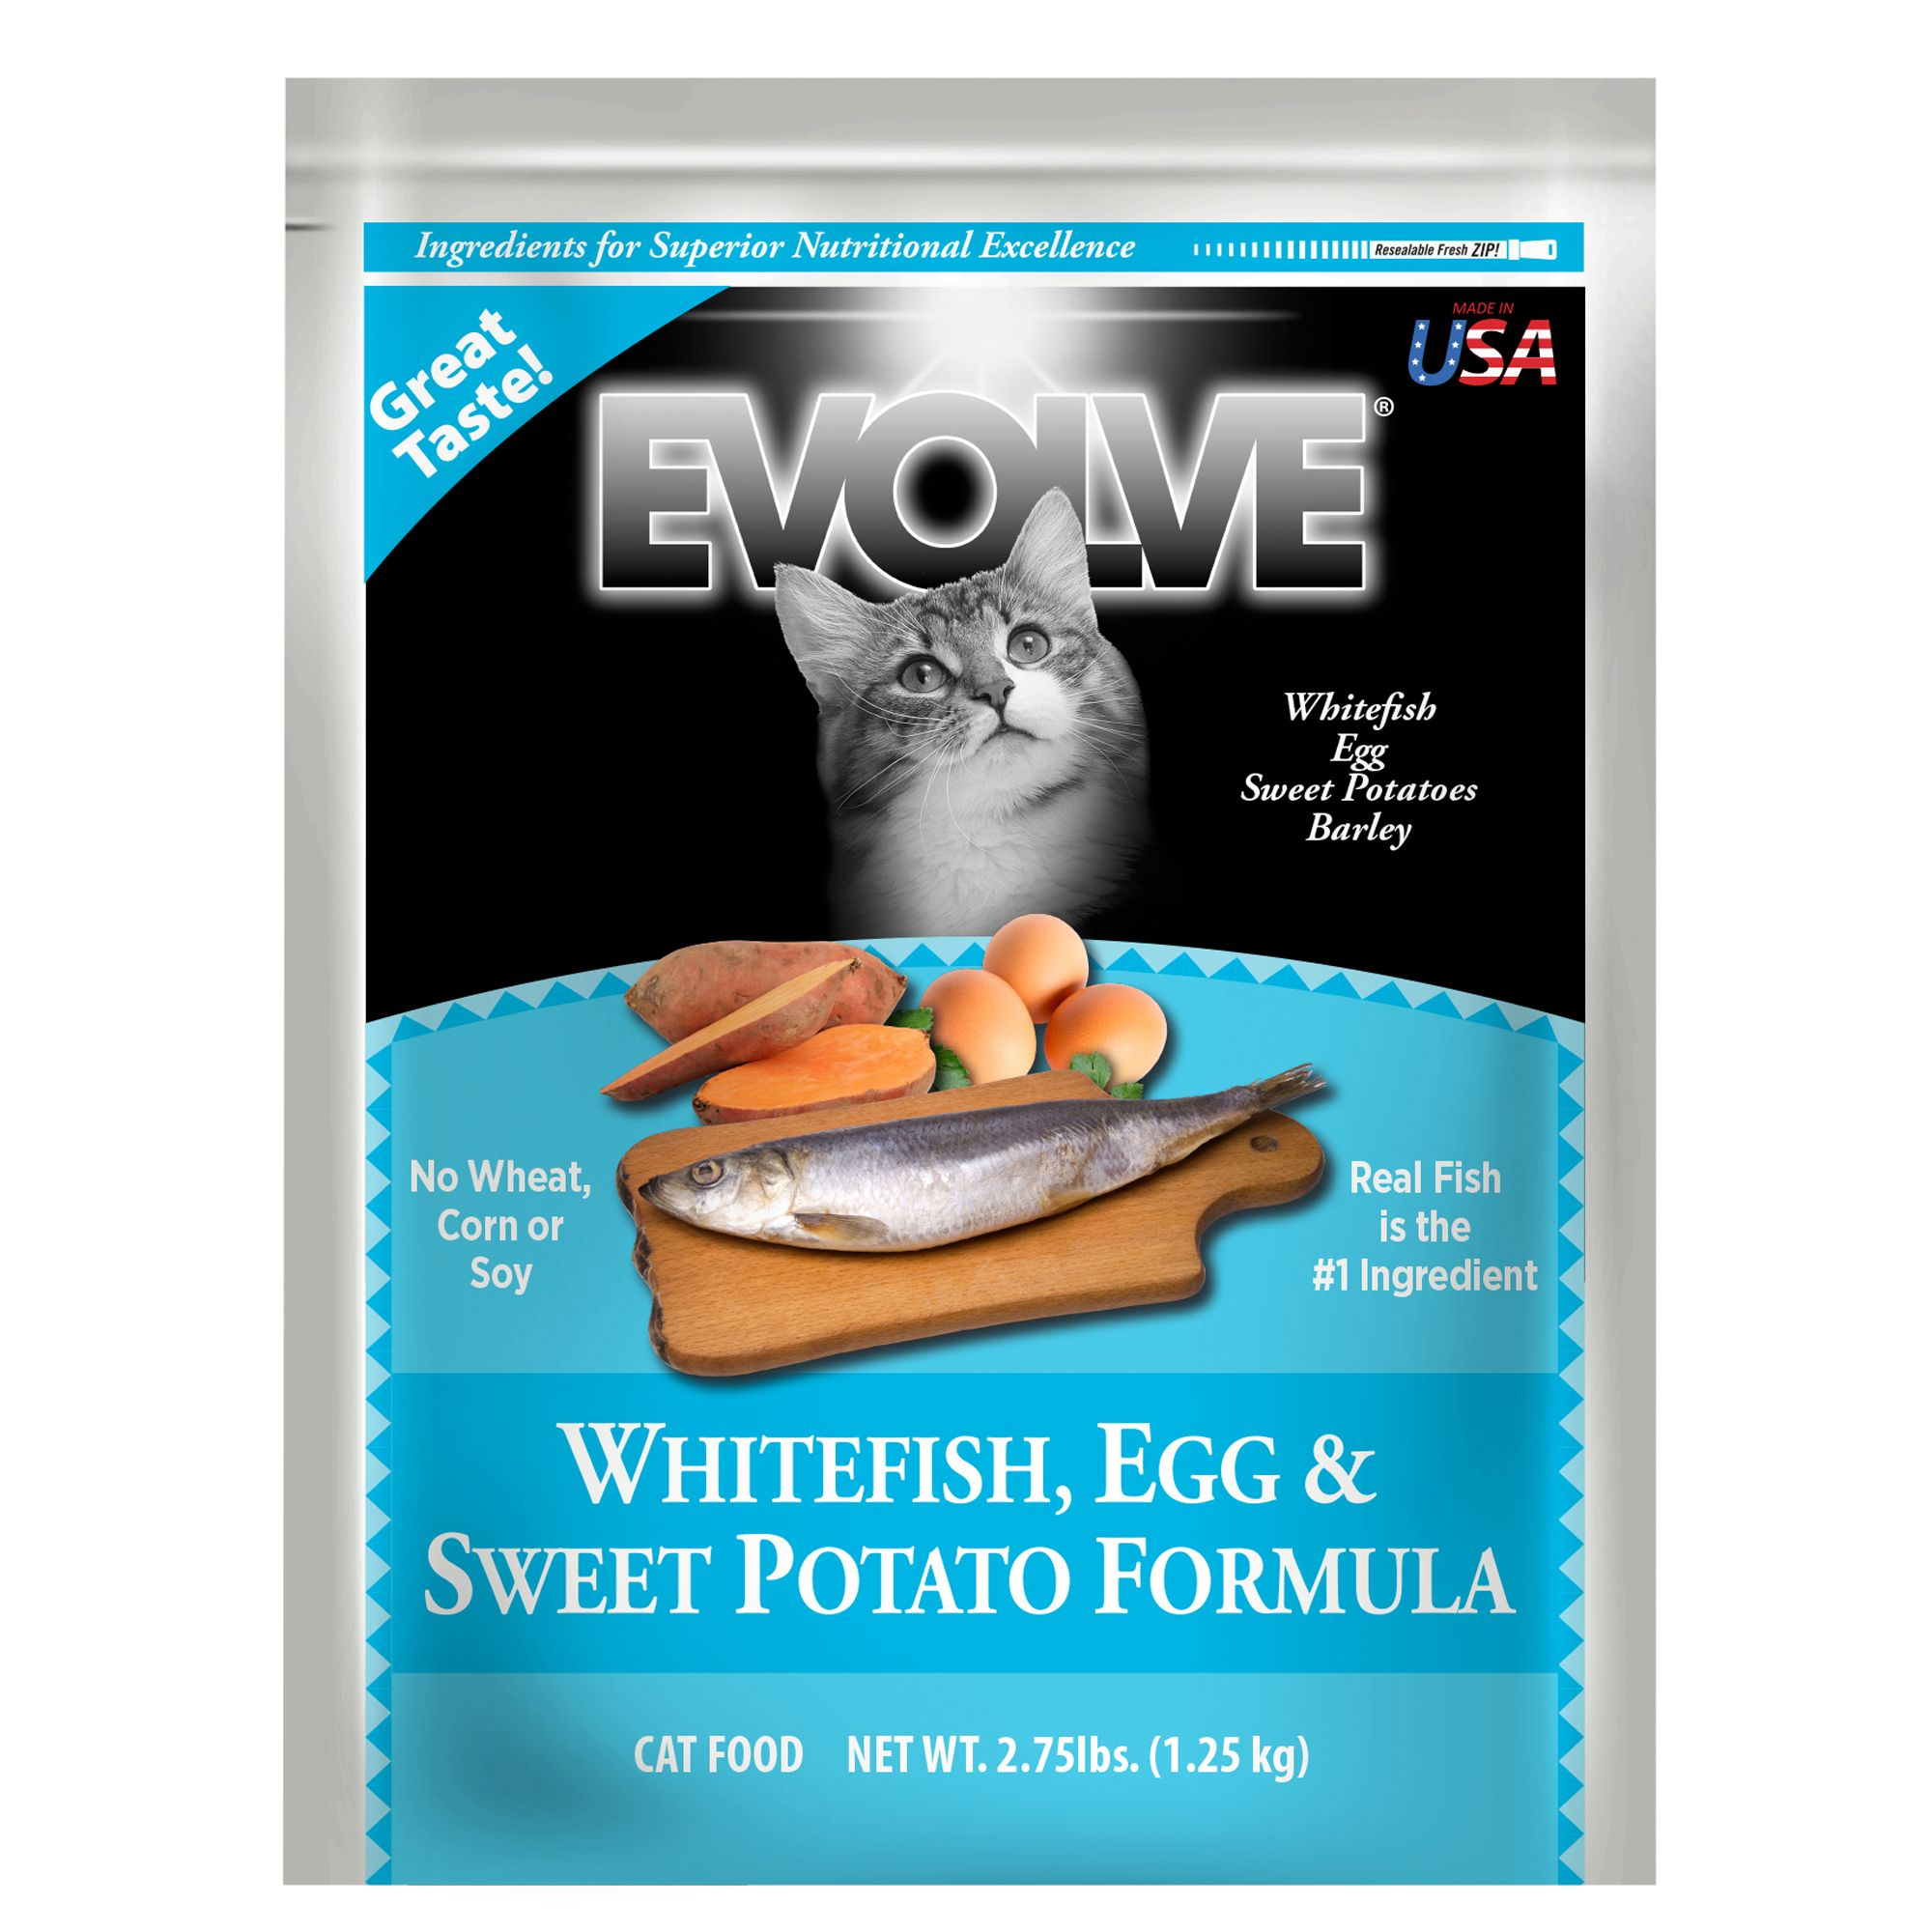 Petsmart Animals Pet Supplies Pro Plan Adult Sensitive Digestion 25kg Free Mug Evolve Cat Food Whitefish Egg And Sweet Potato